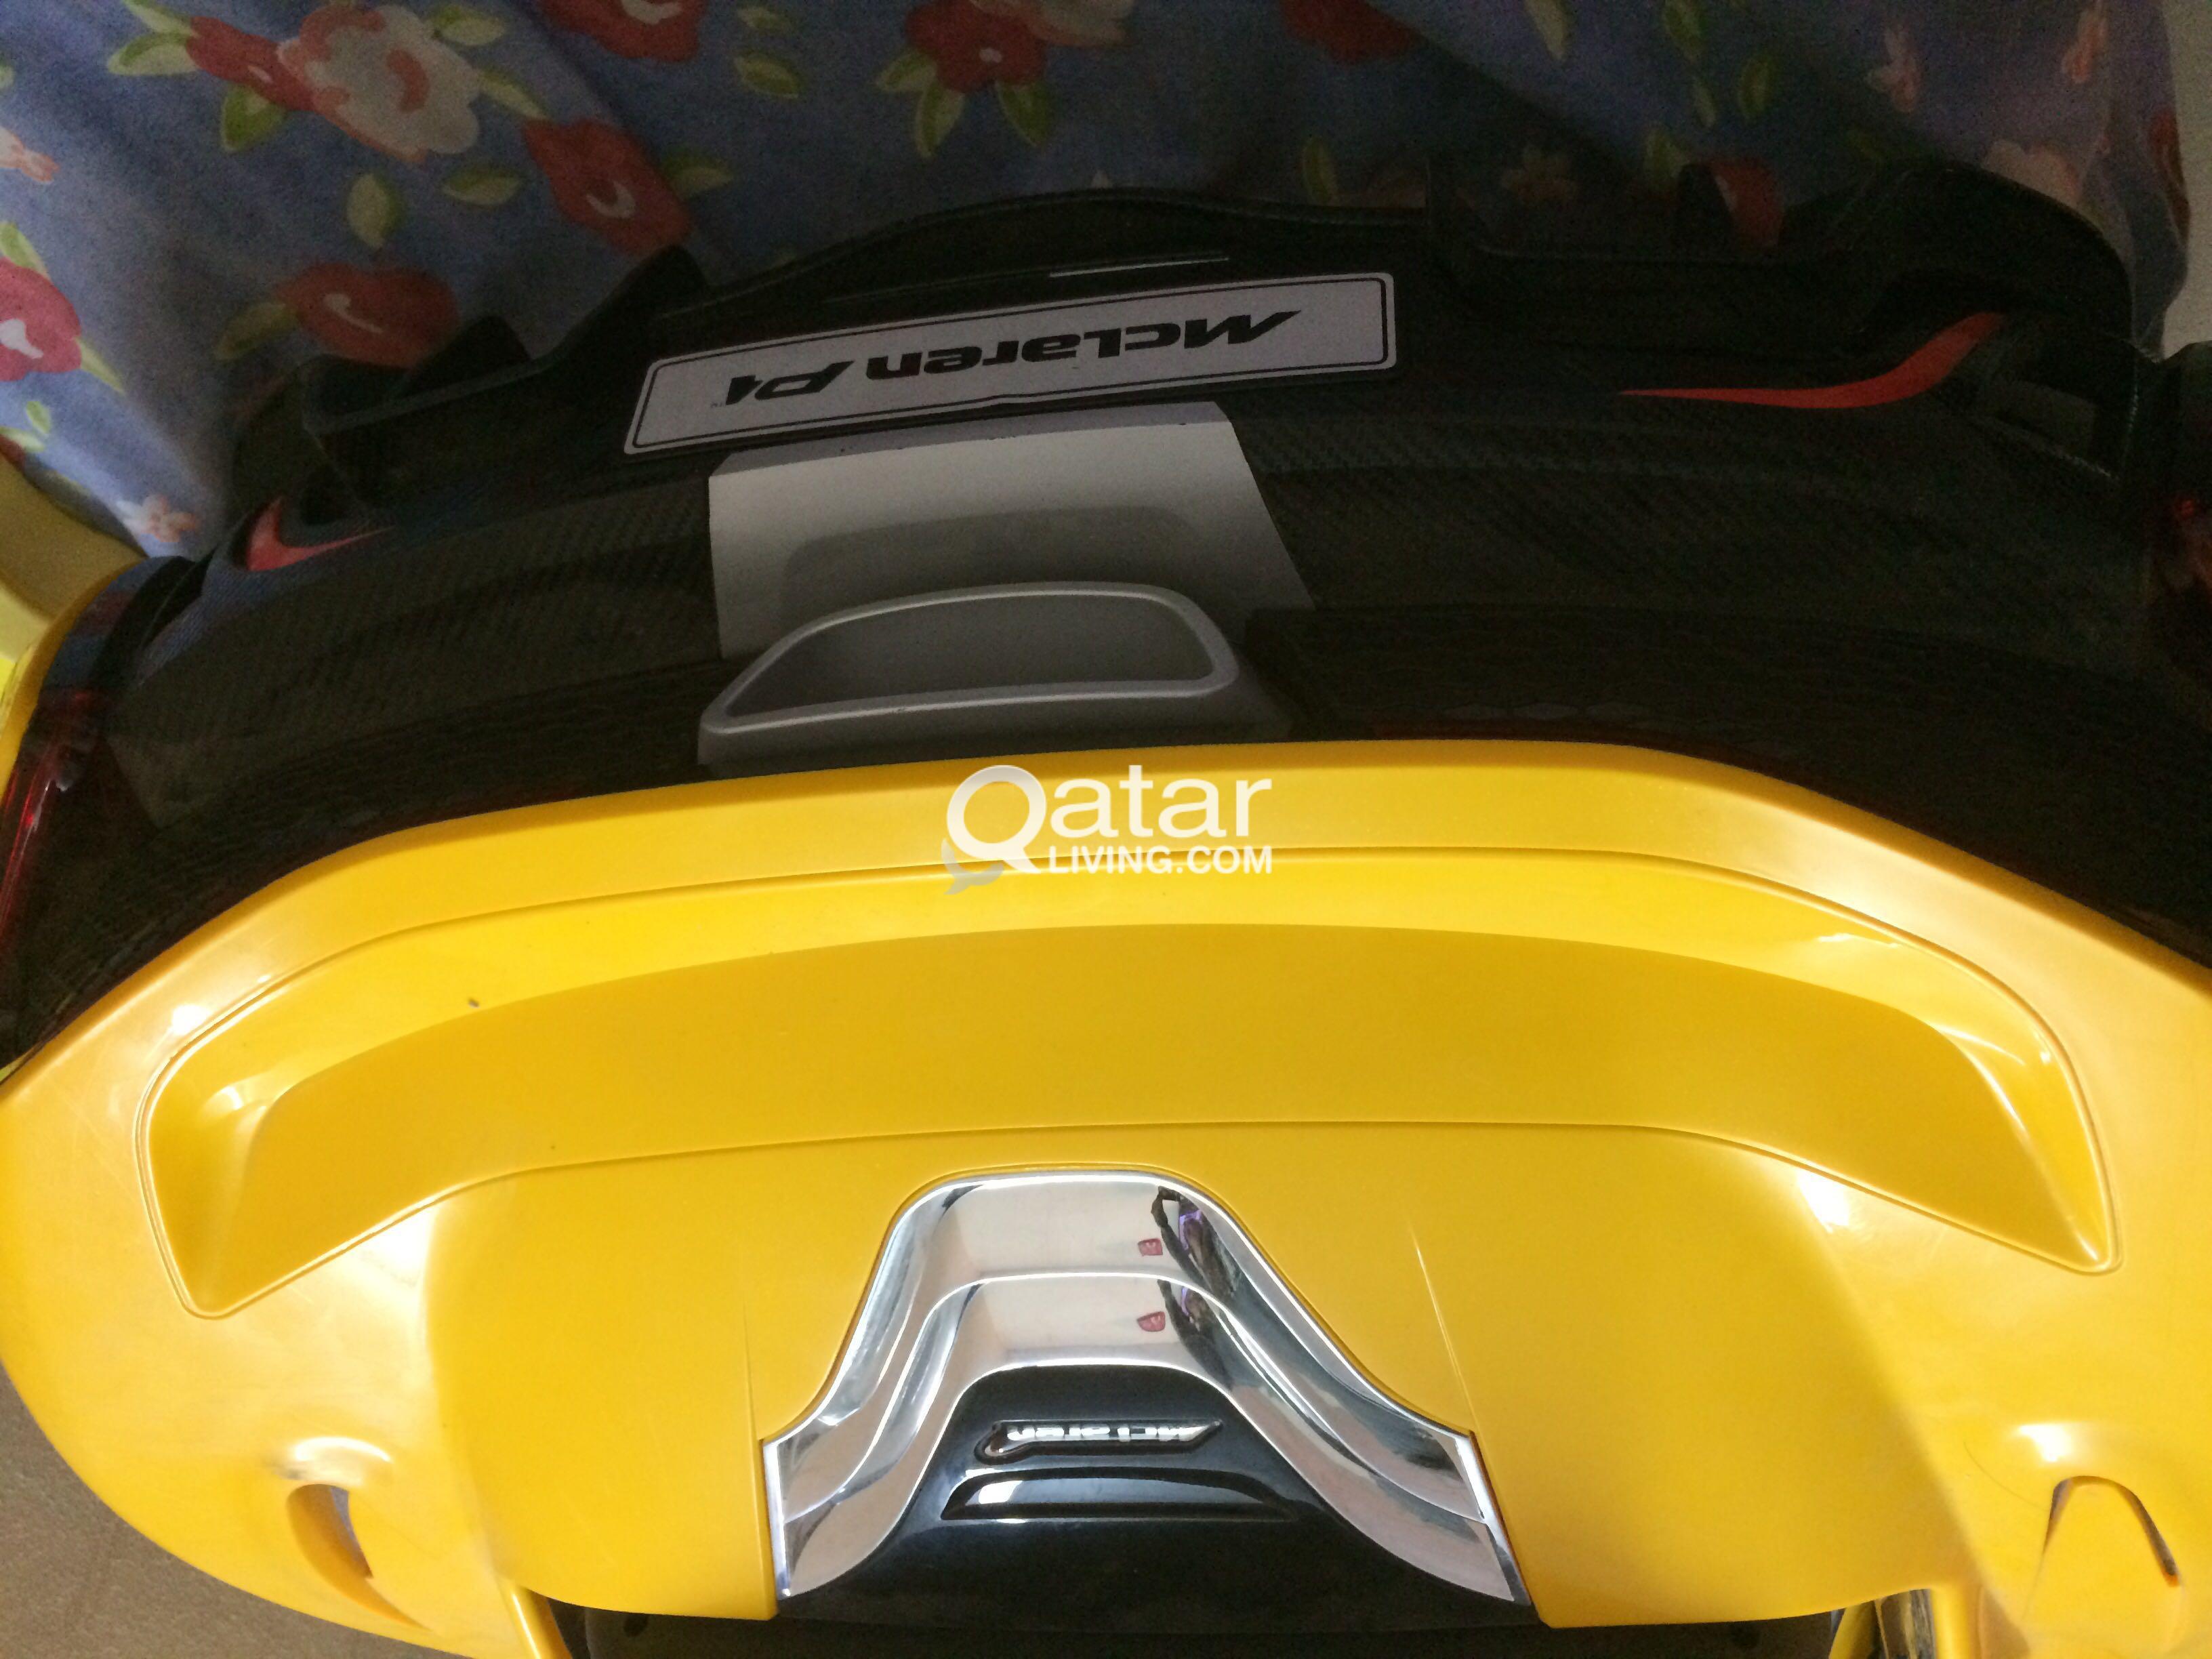 baby swing chair qatar ikea wicker kids rechargeable car | living